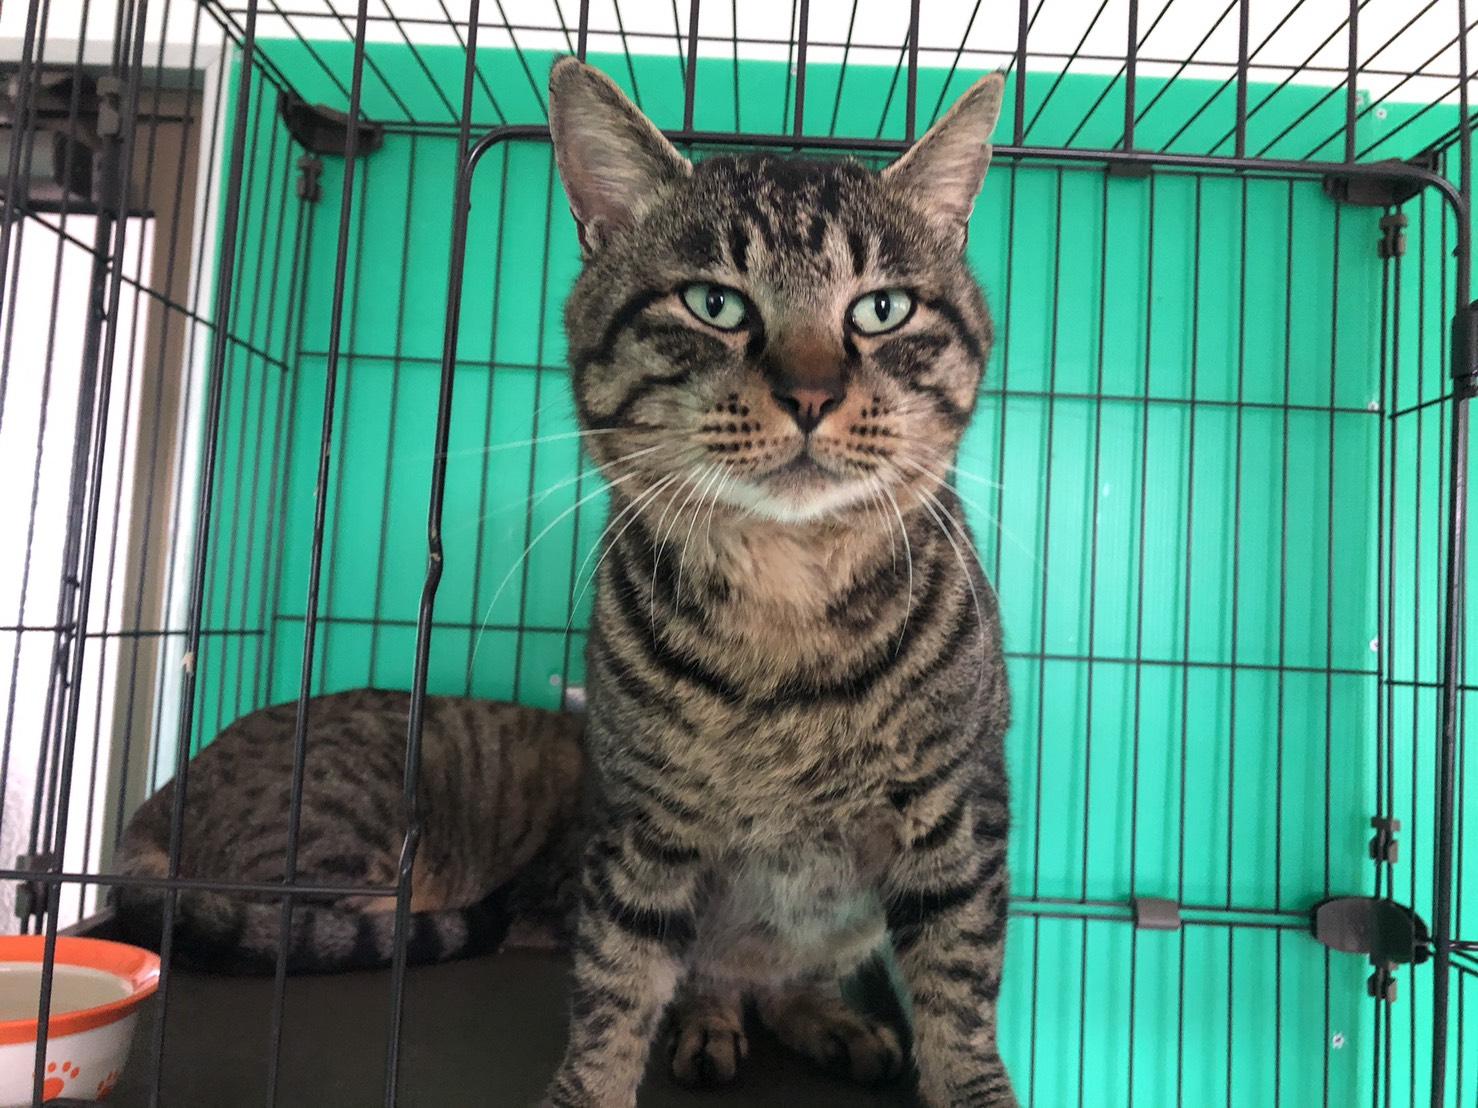 <ul> <li>猫種:日本猫 キジトラ</li> <li>性別:男の子</li> <li>名前:おっとり</li> <li>年齢:2017年7月17日</li> <li>保護経緯:飼い主様が高齢で、引越しするため飼育困難になり引き取りました</li> </ul>